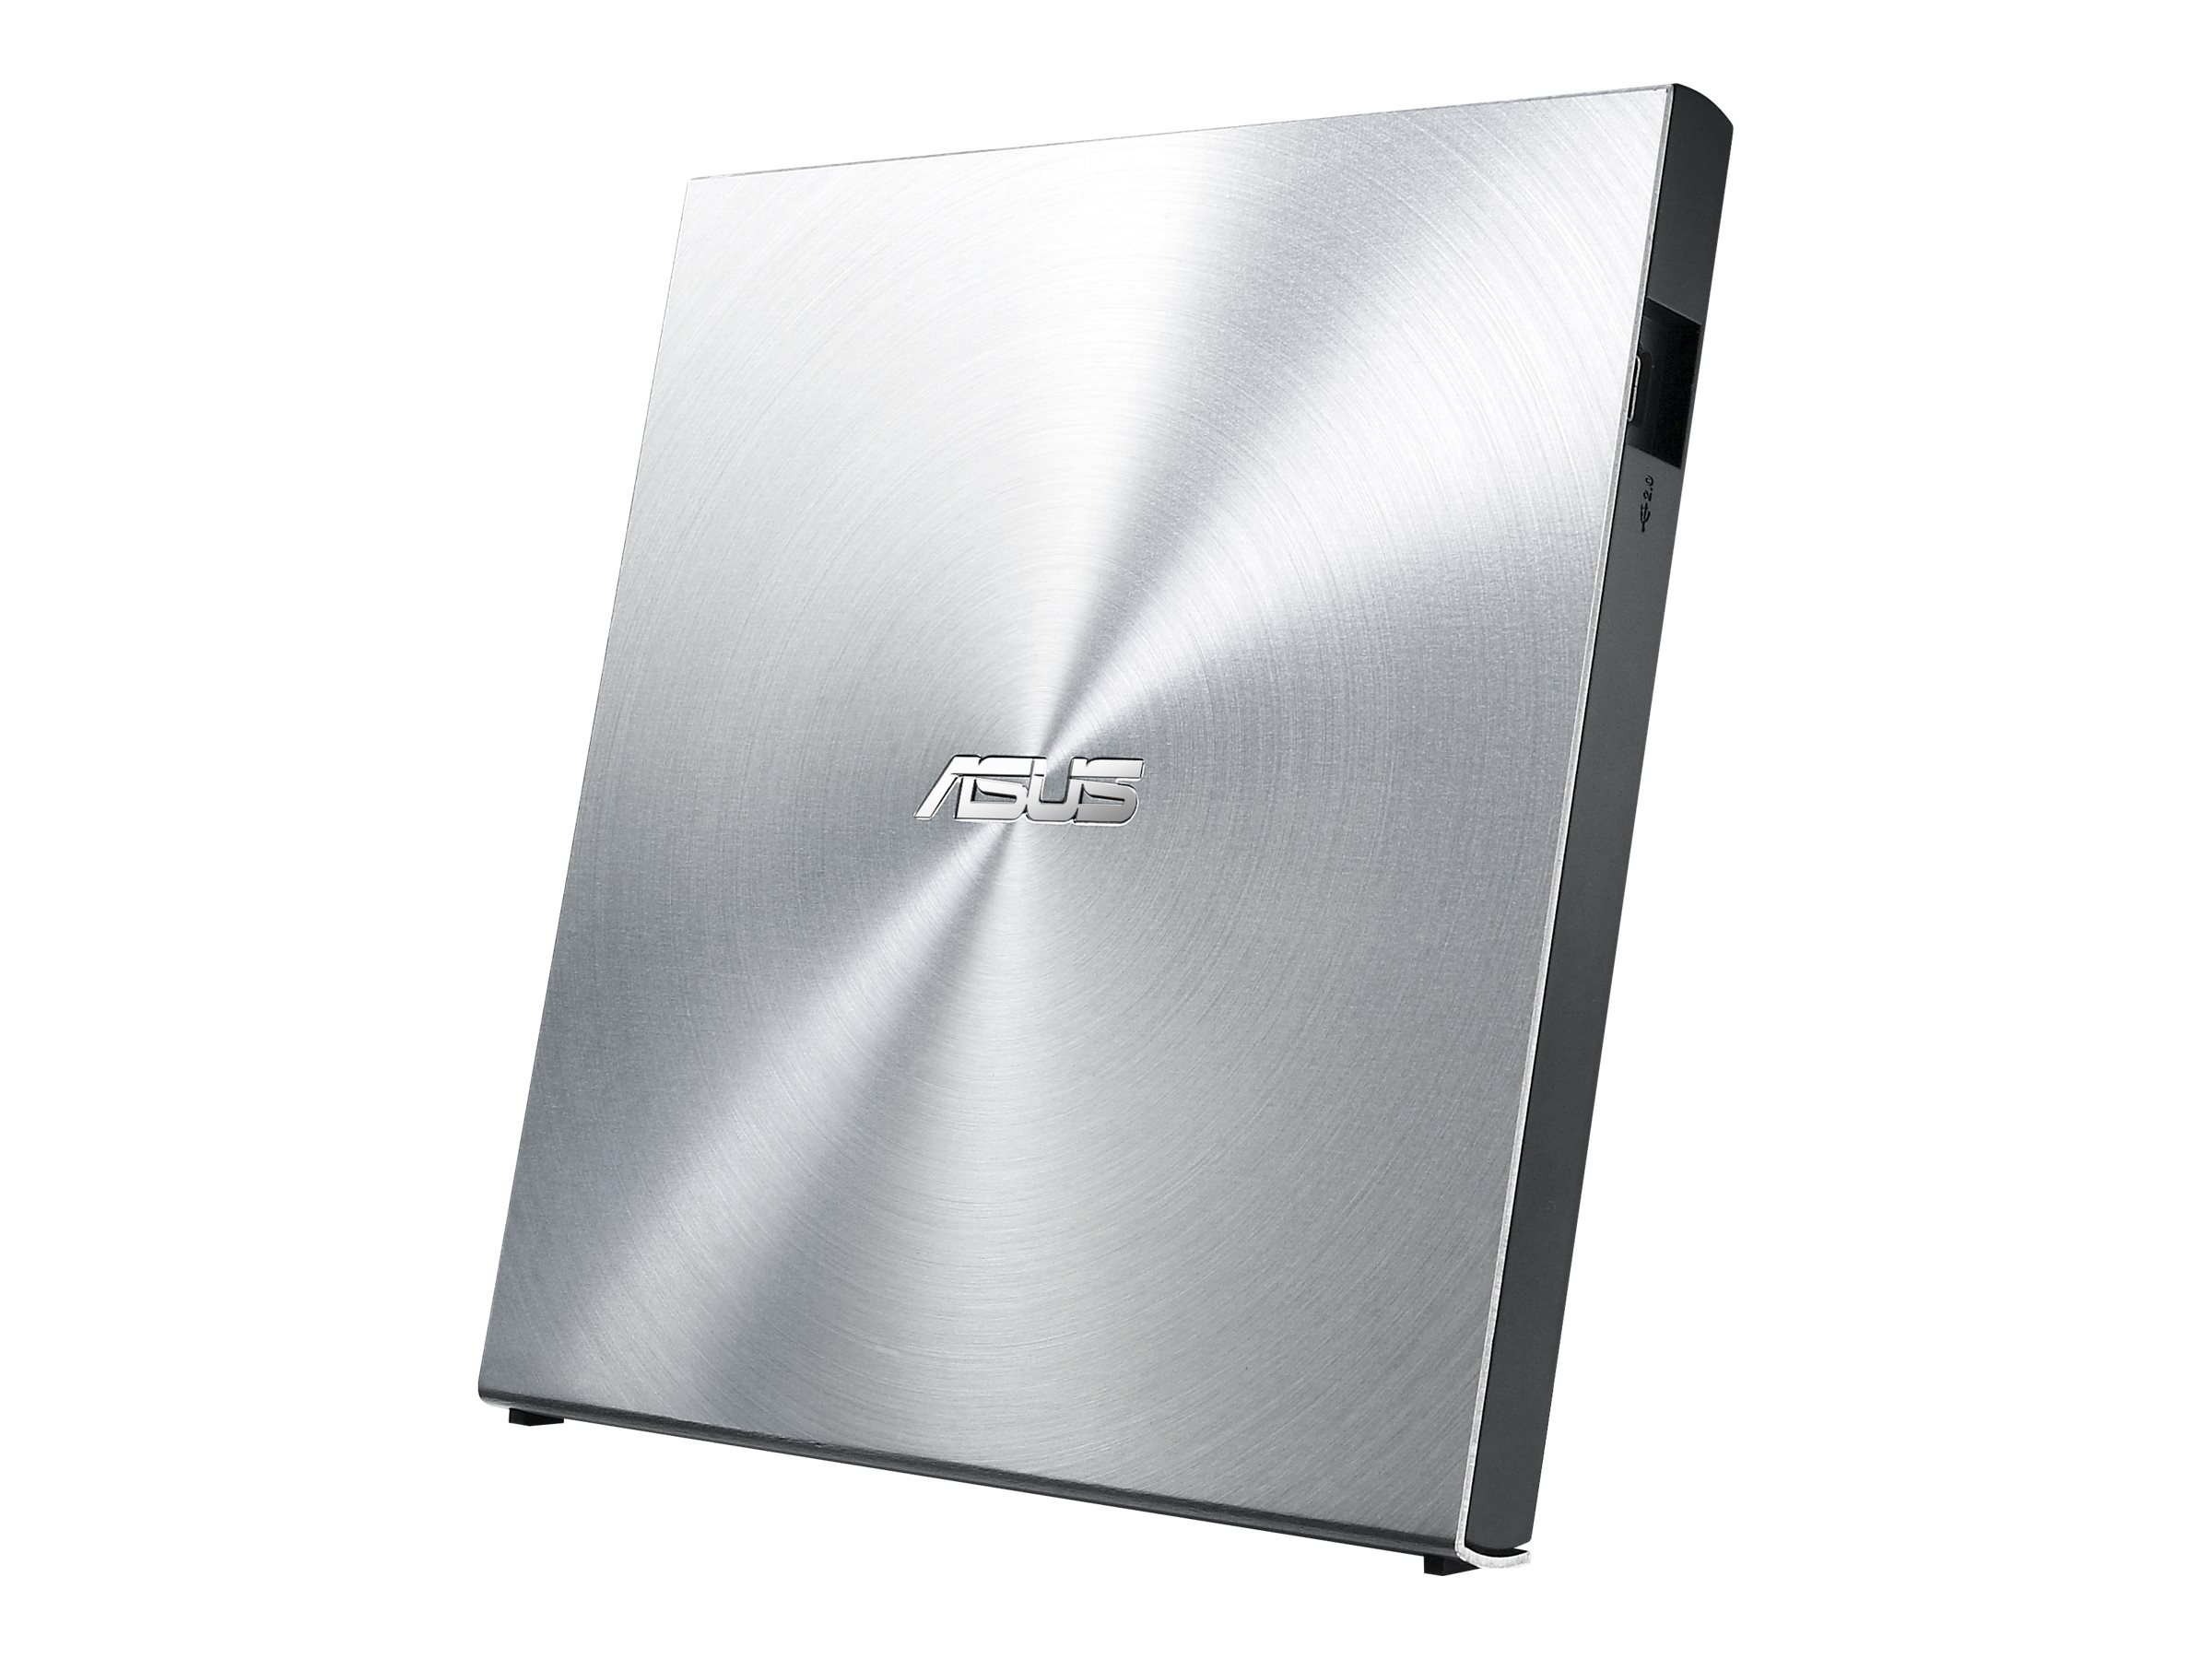 ASUS SDRW-08U5S-U - Laufwerk - DVD±RW (±R DL) / DVD-RAM